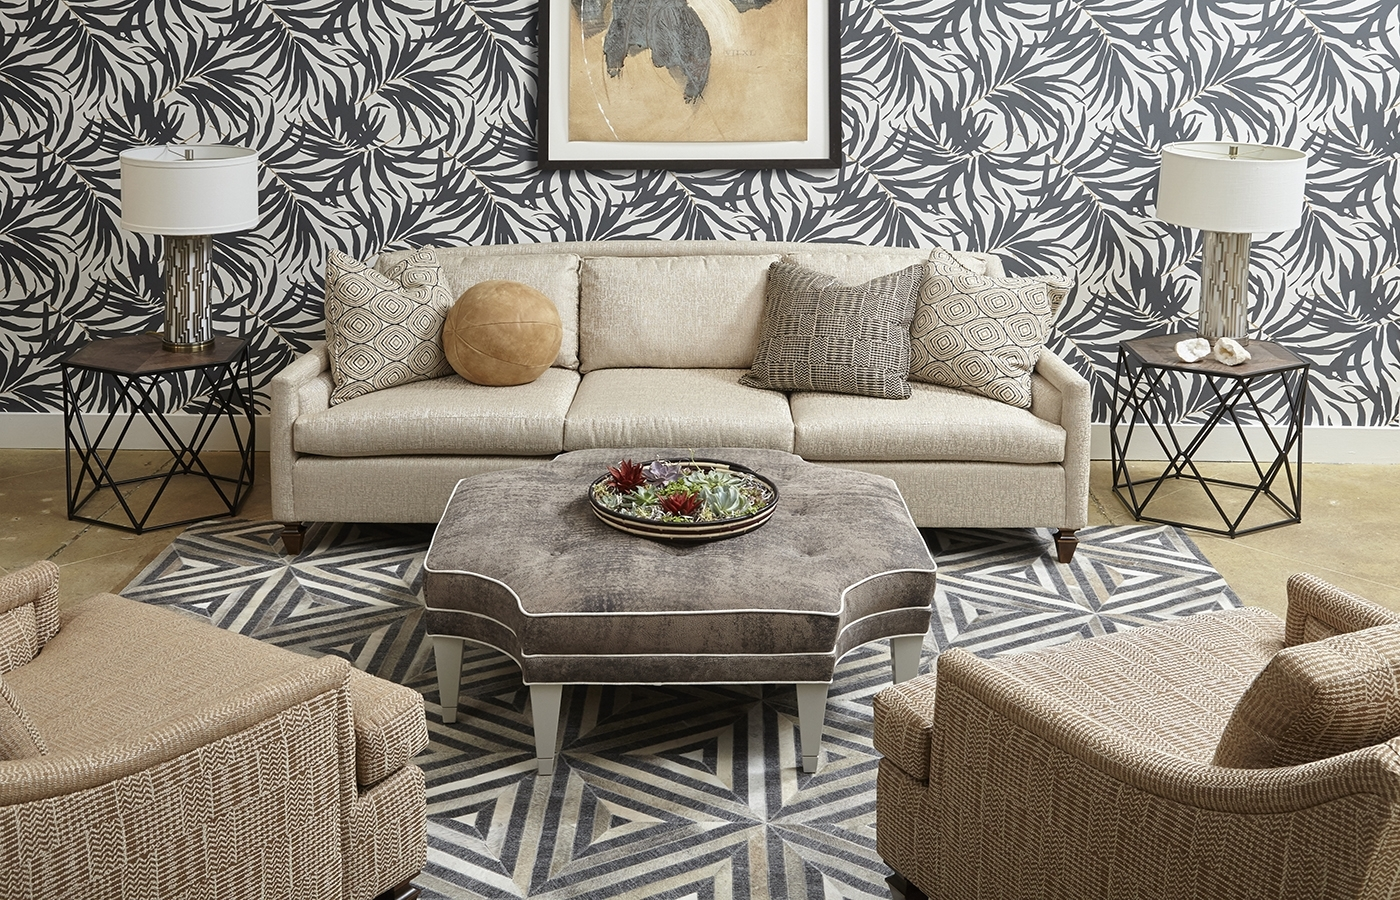 Norwalk Furniture In Norwalk Sofas (Image 7 of 10)